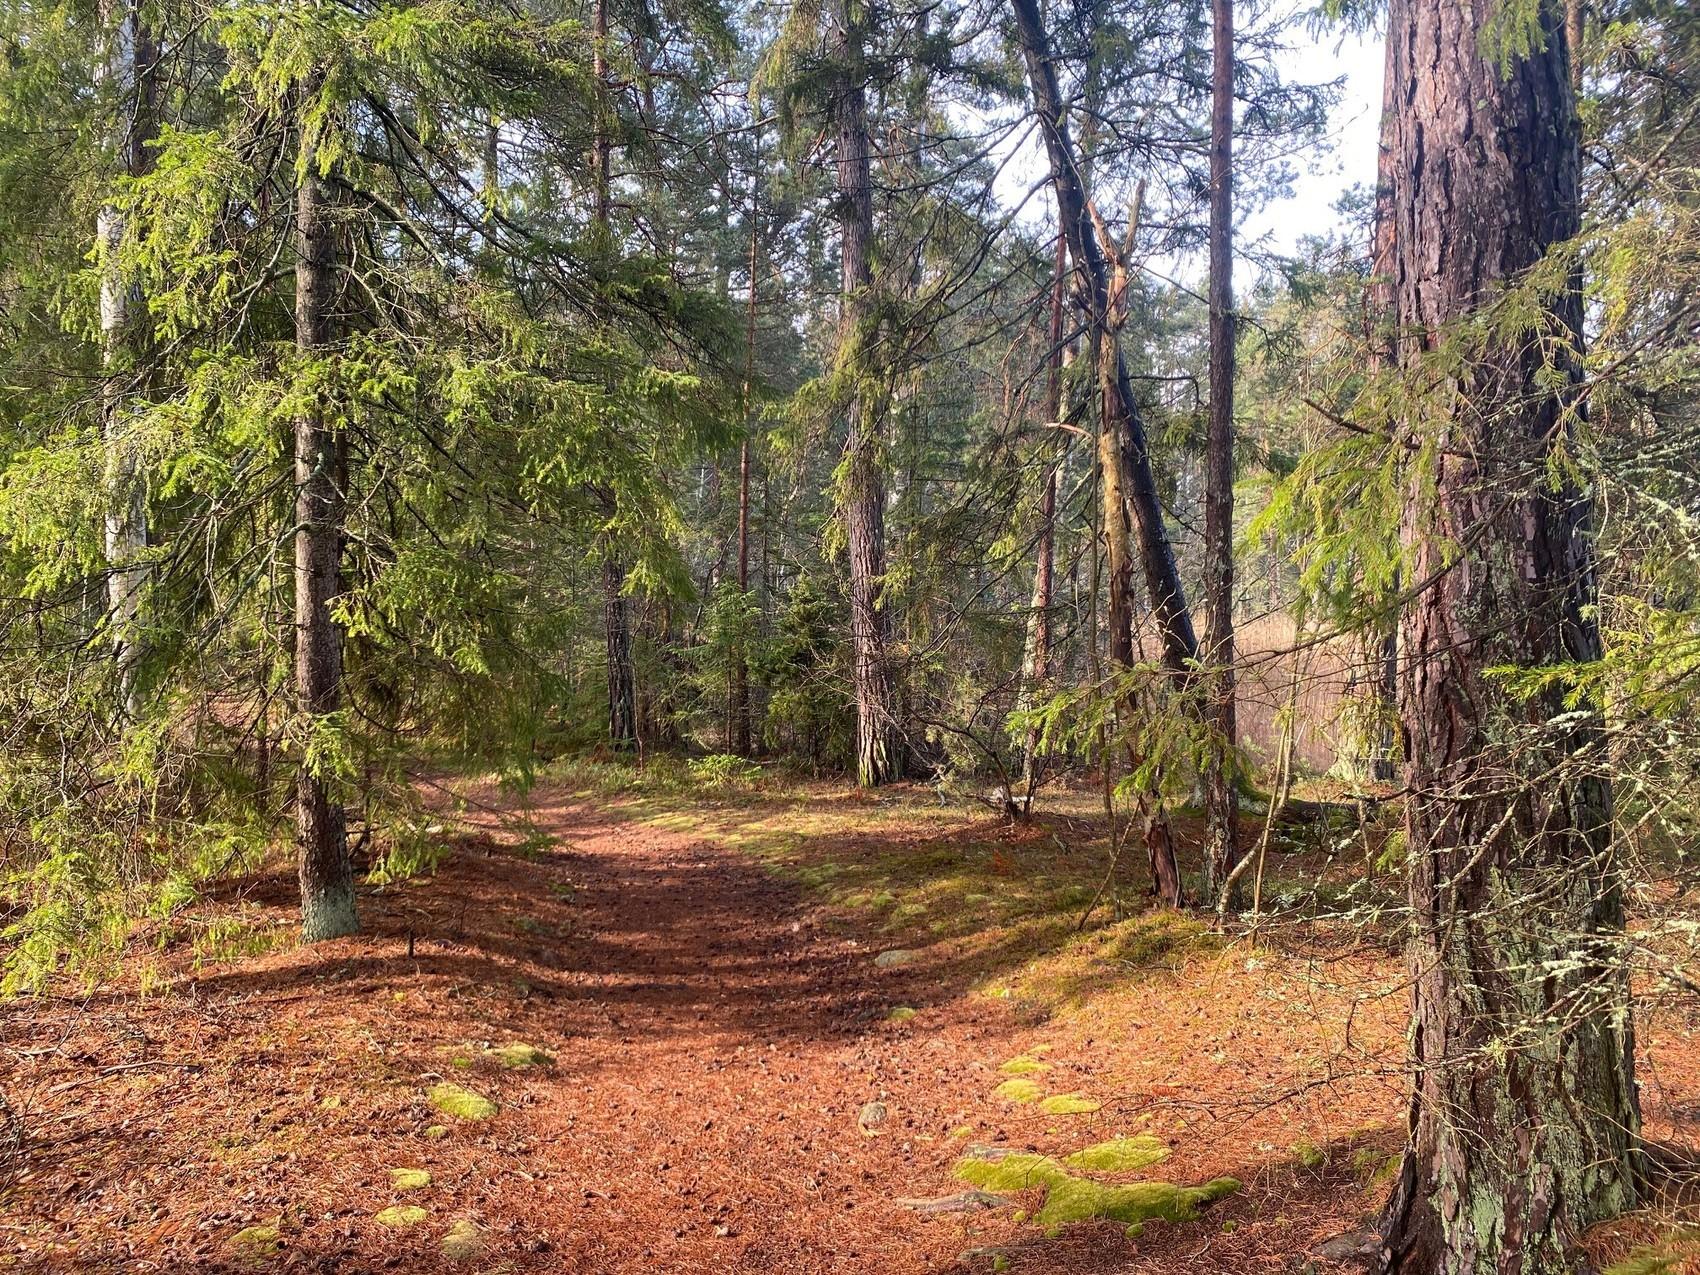 Stig genom skogen